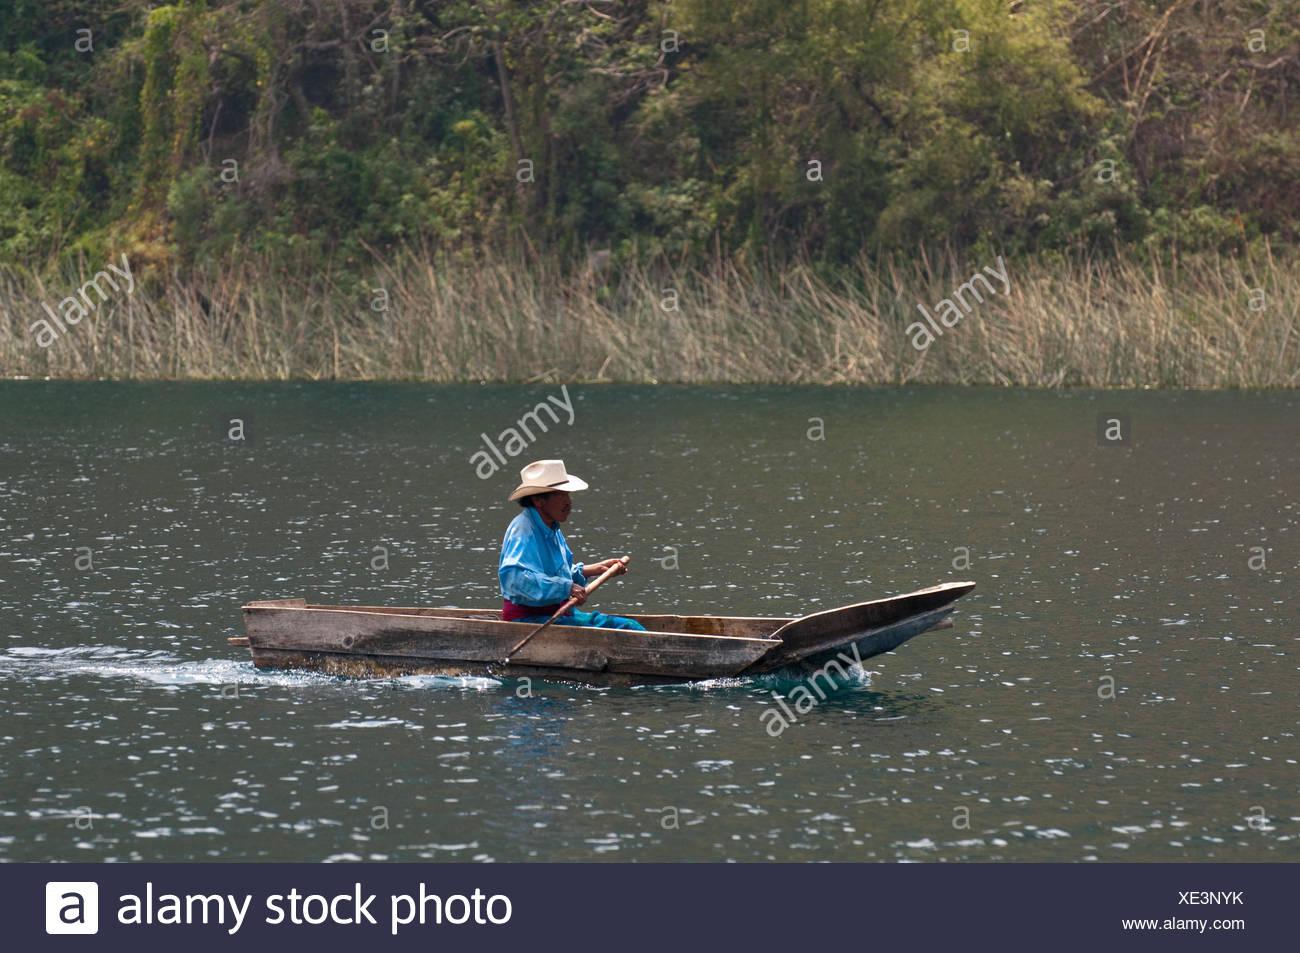 Fisherman on Lago de Atitlan lake, Guatemala, Central America - Stock Image